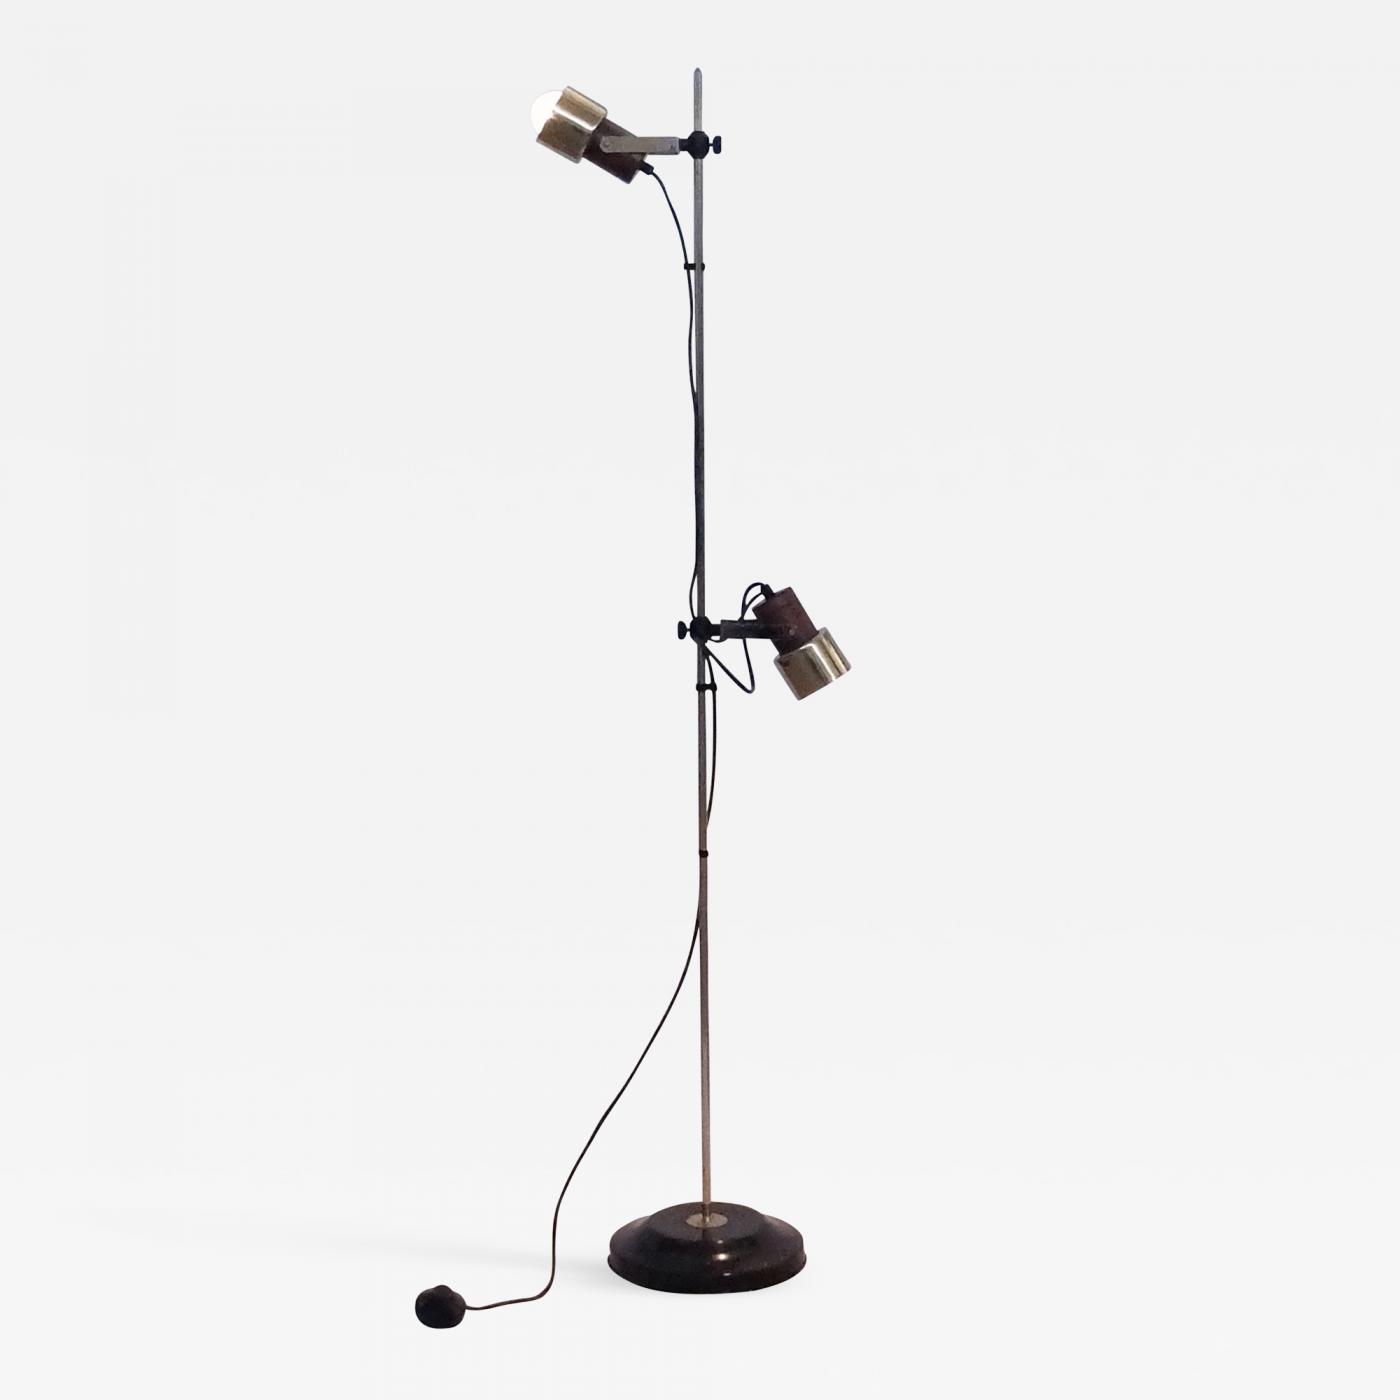 Italian Mid Century Modern Floor Lamp With Adjustable Spotlights From The 1950s